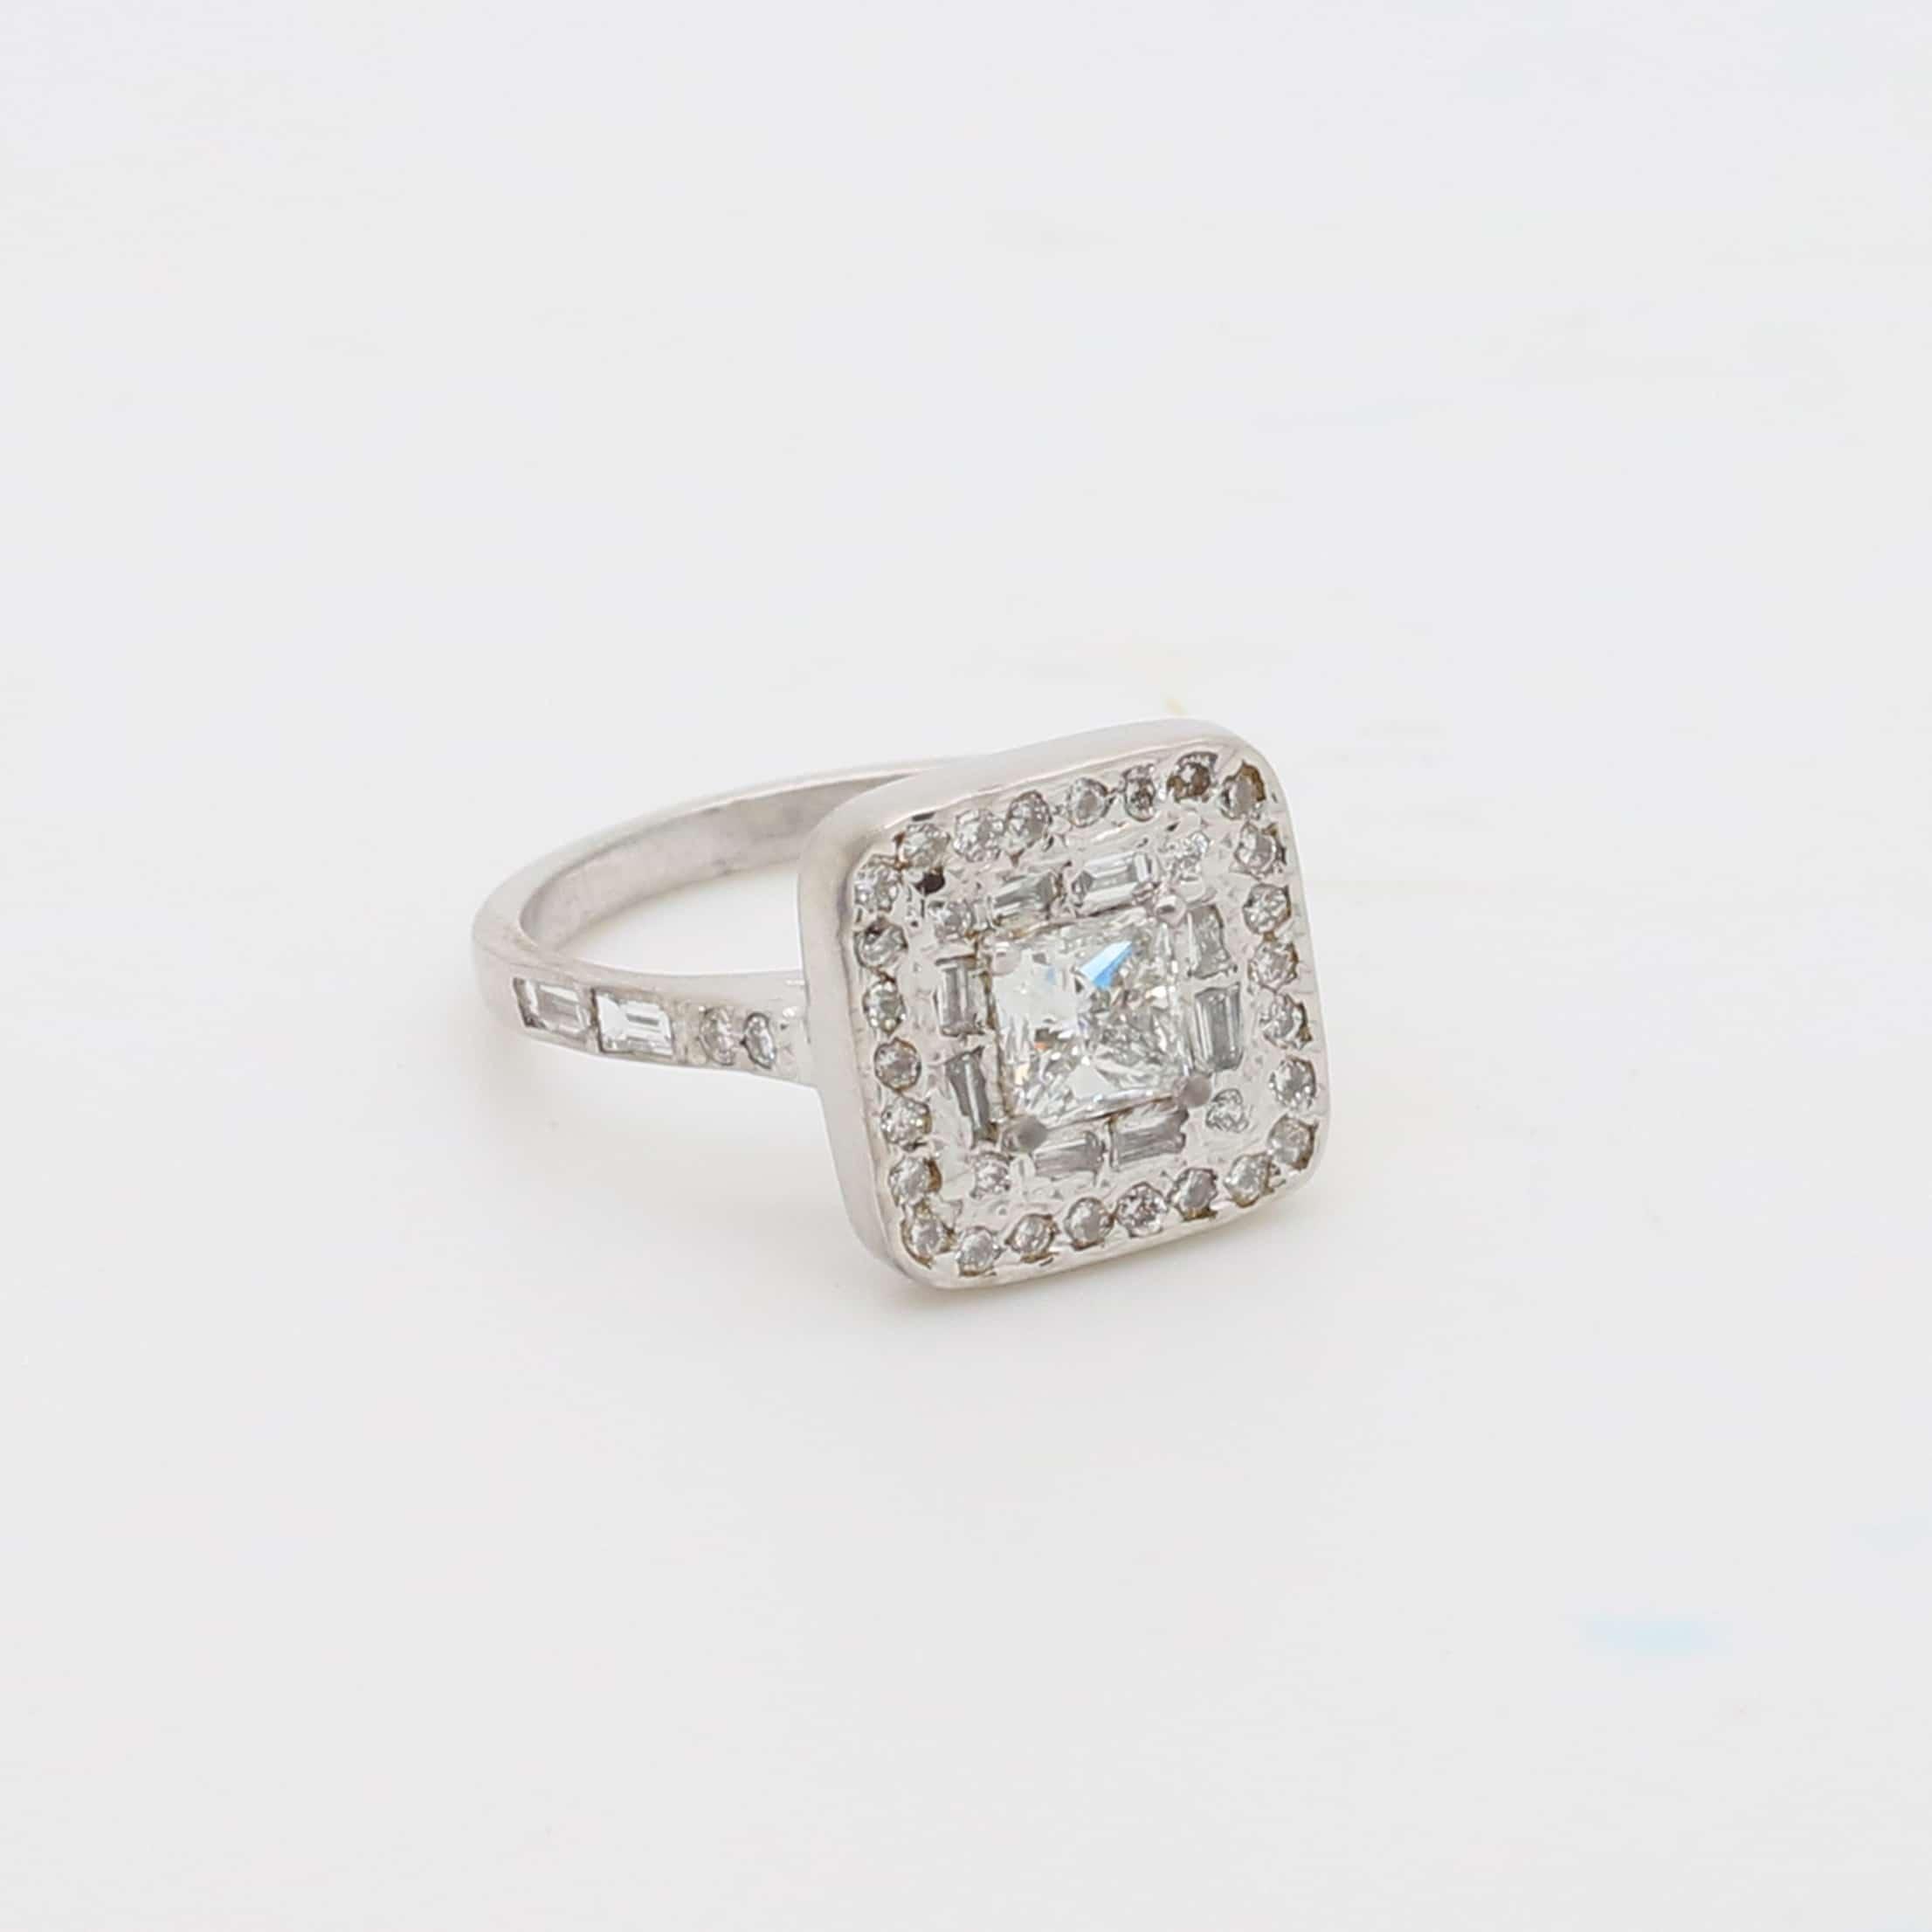 Bespoke white gold diamond halo ring